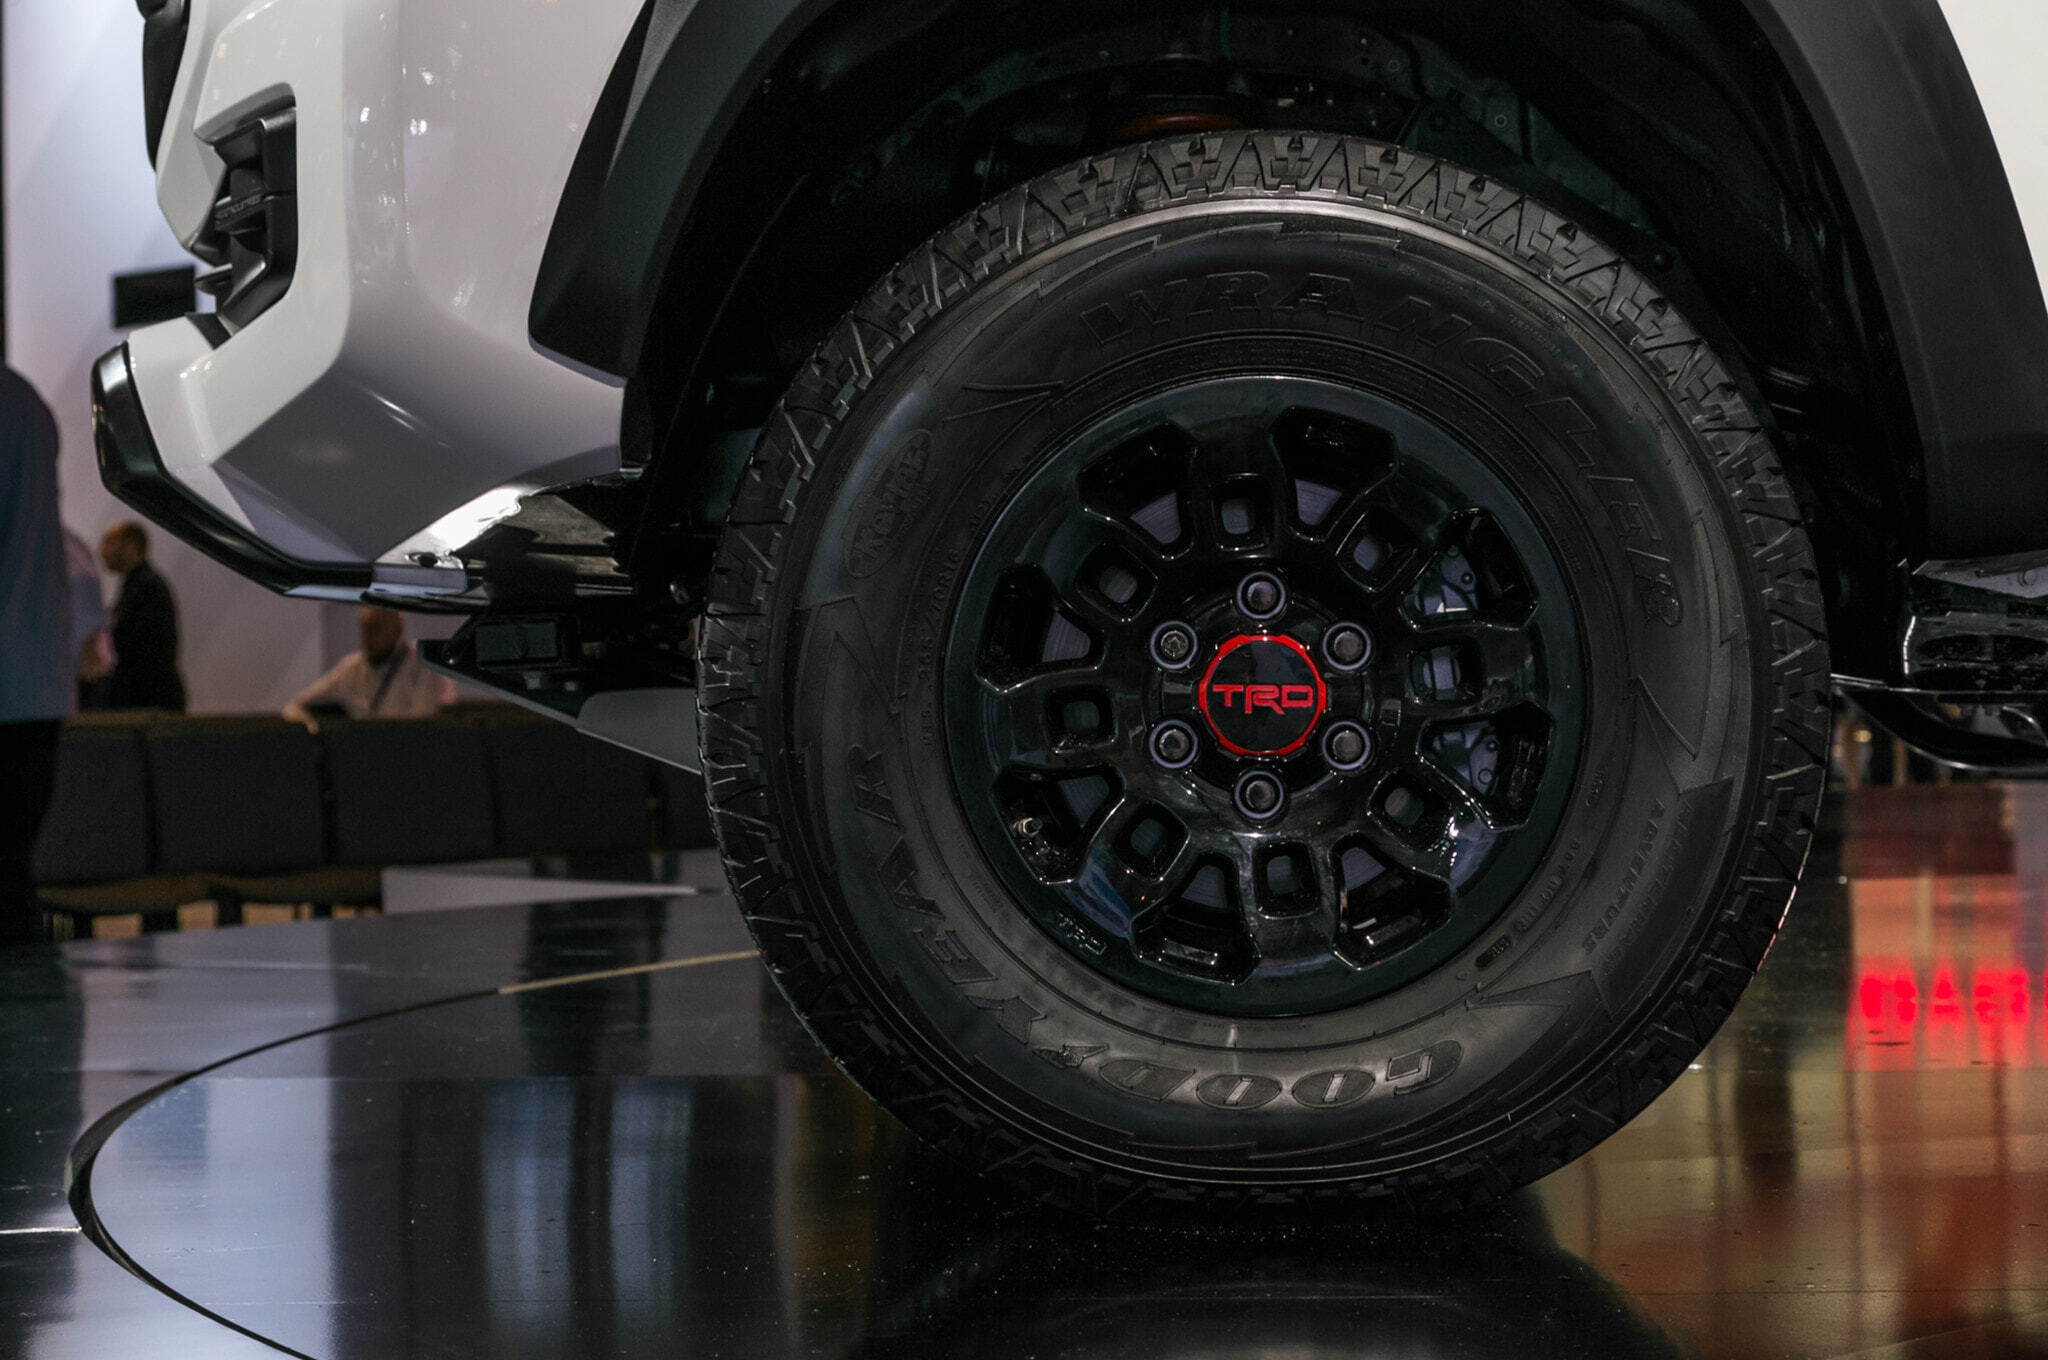 2019-Toyota-Tacoma-TRD-Pro-front-wheel